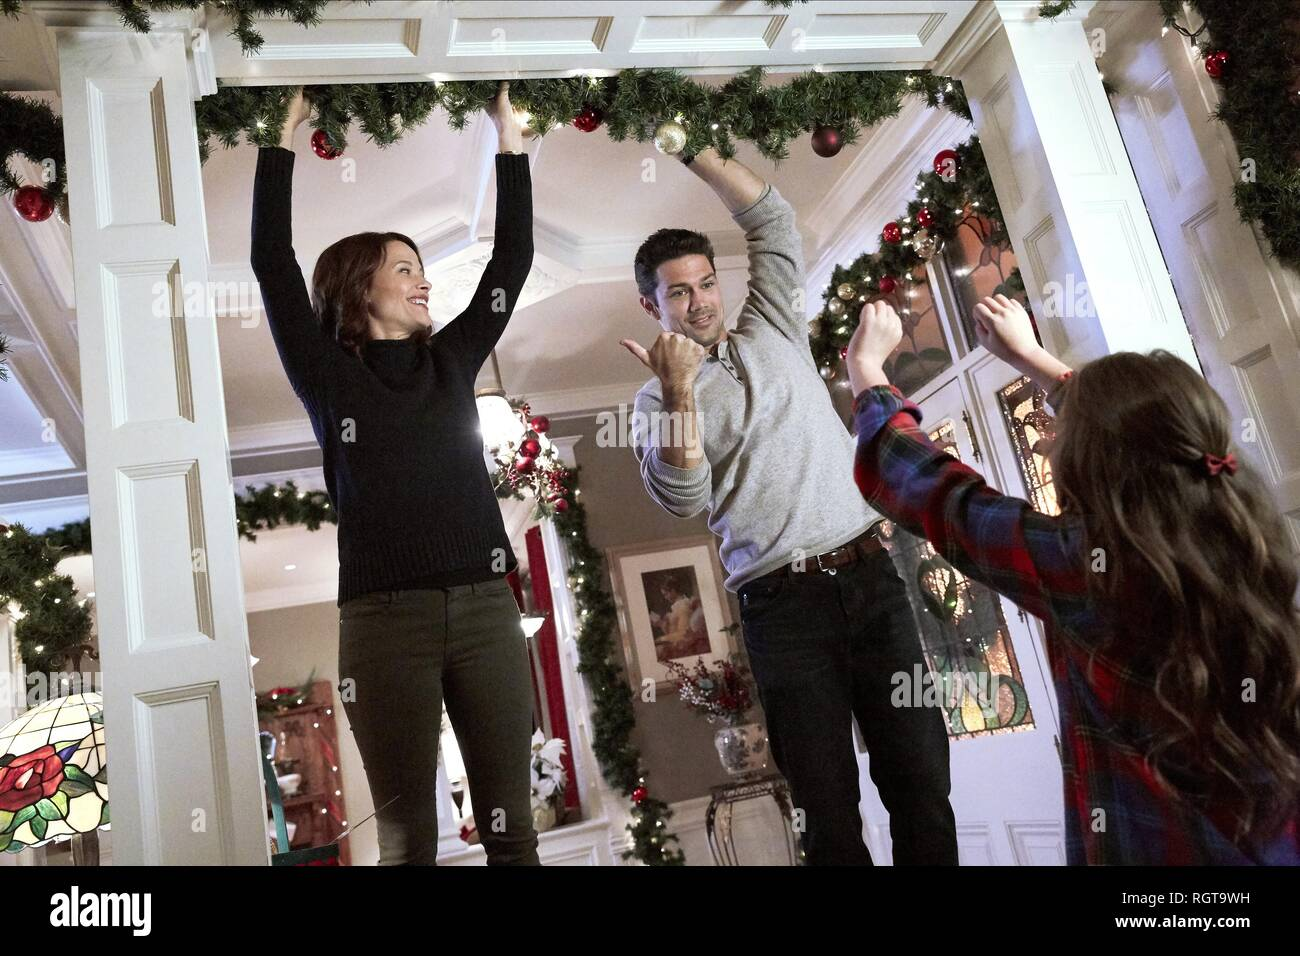 Hope At Christmas.Hope At Christmas Scottie Thompson Ryan Paevey 2018